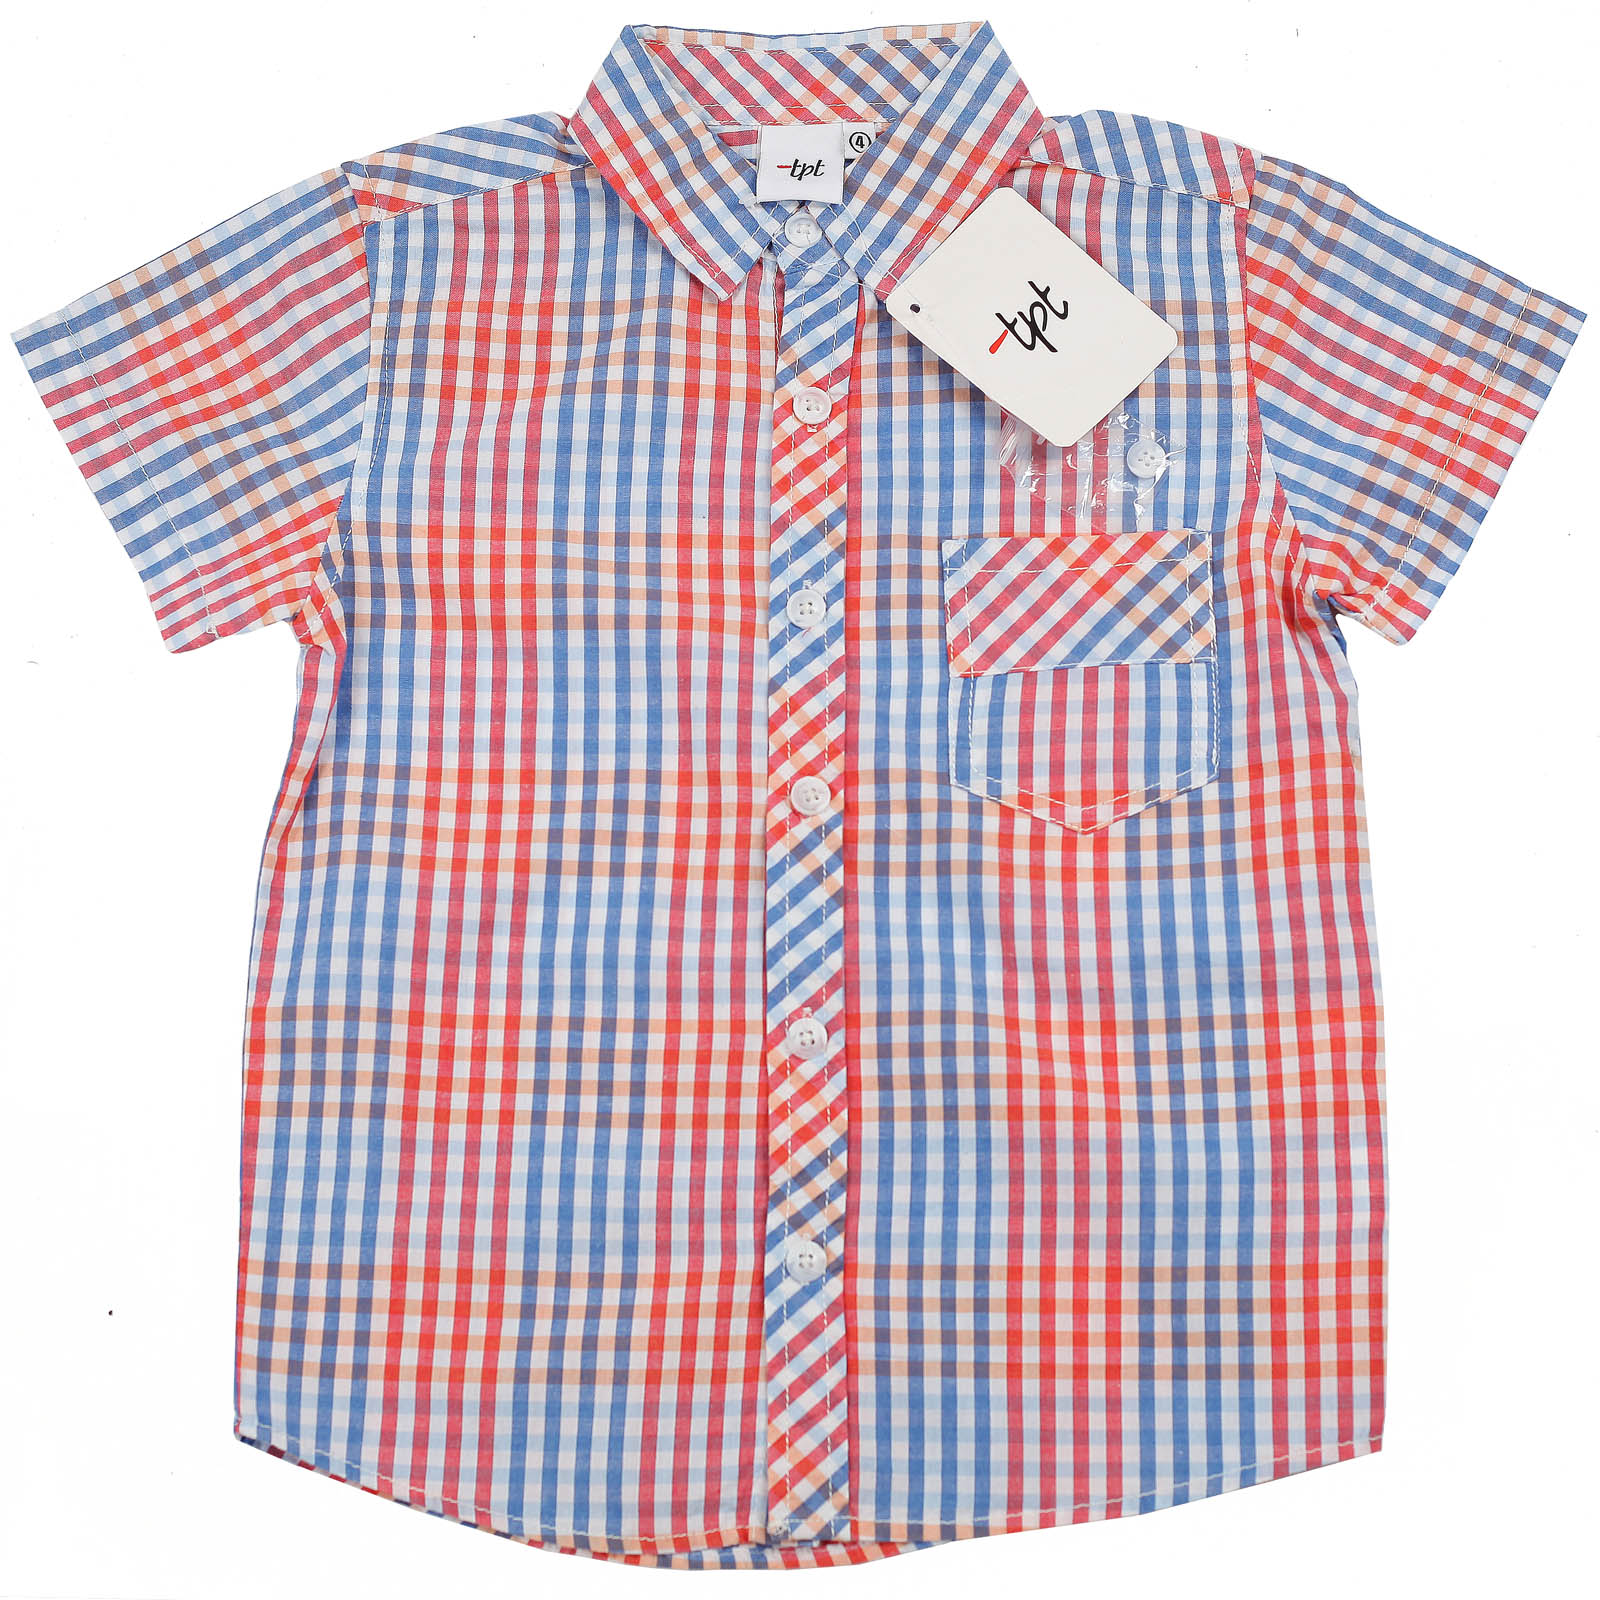 Лентняя рубашка от бренда TPL с коротким рукавом для мальчика